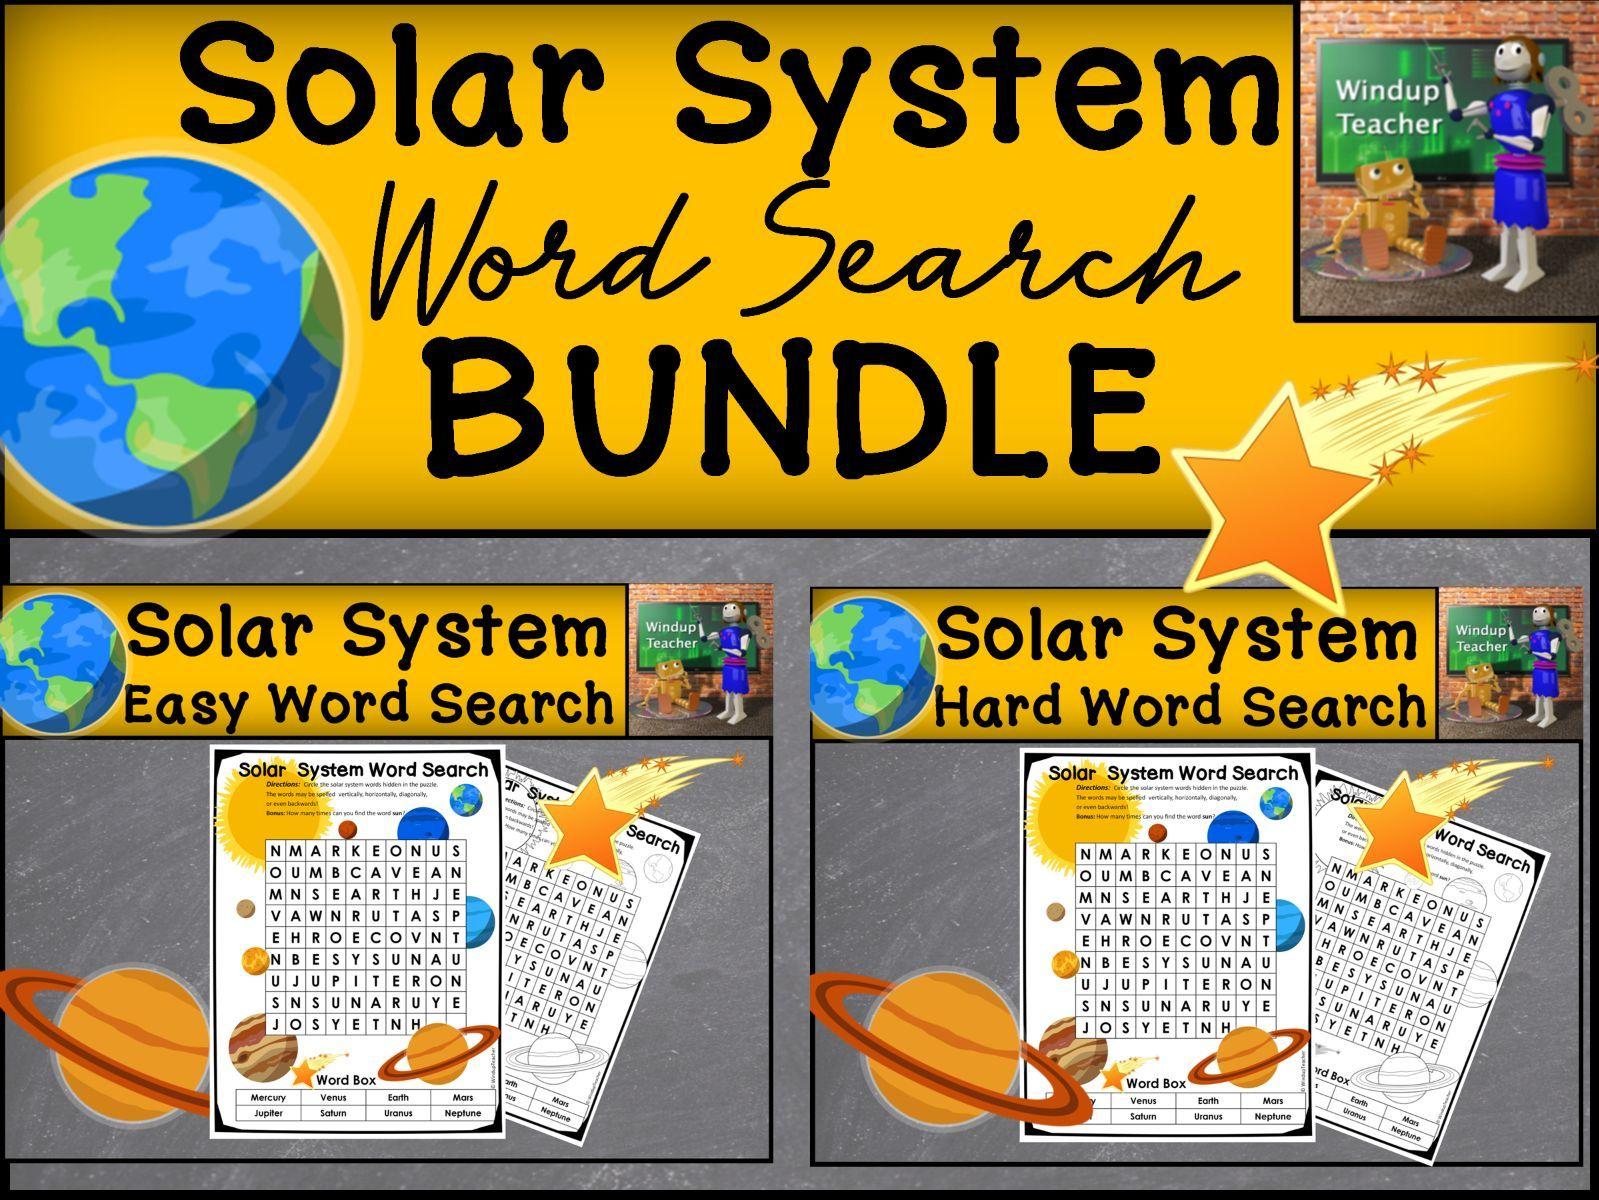 Solar System Word Search Bundle - 2 levels